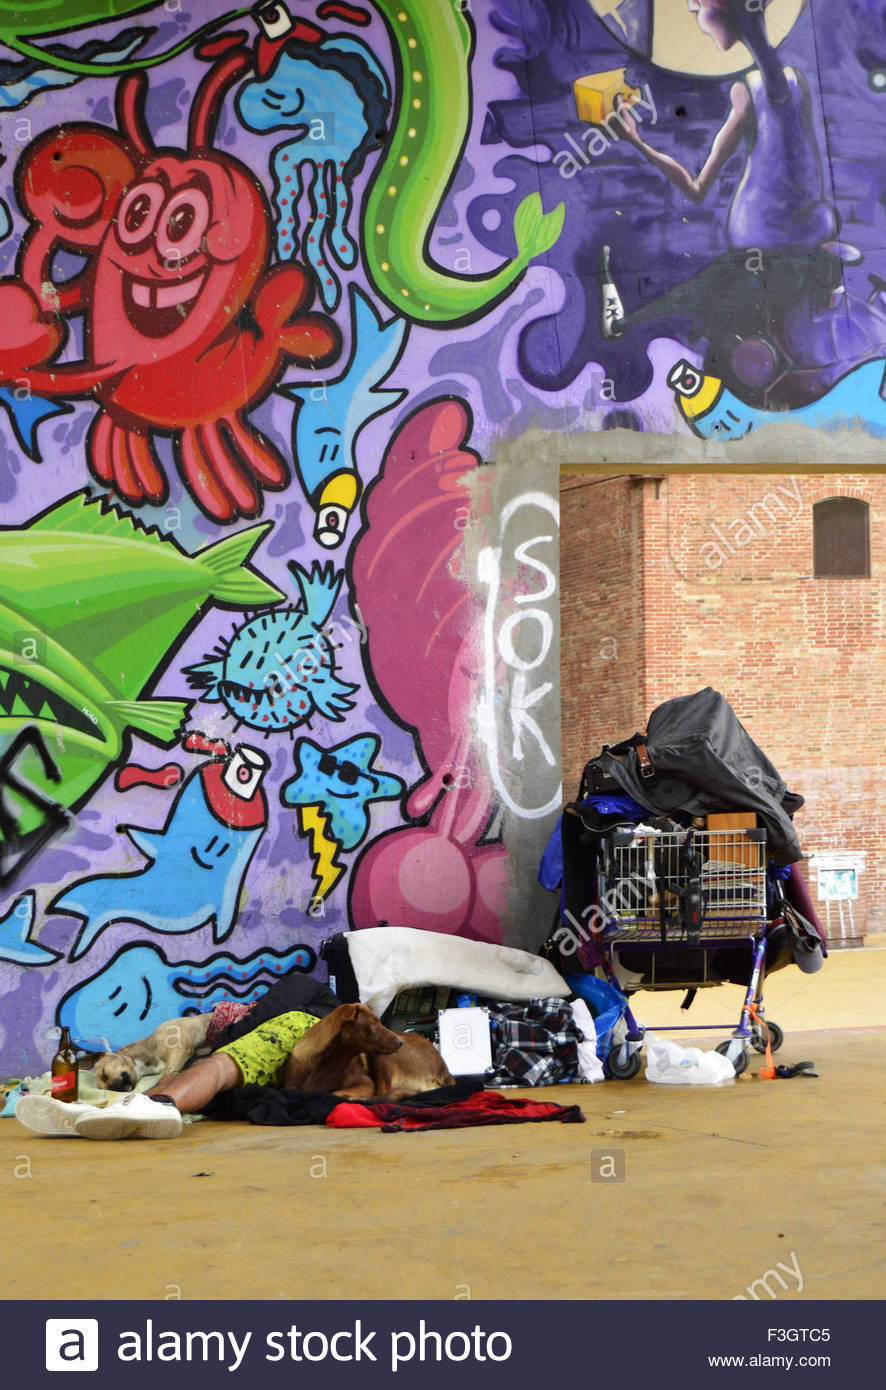 Graffiti wall barcelona - Homeless Shelter Wall With Graffiti Art In El Raval Neighborhood Ciutat Vella Barcelona Spain Europe